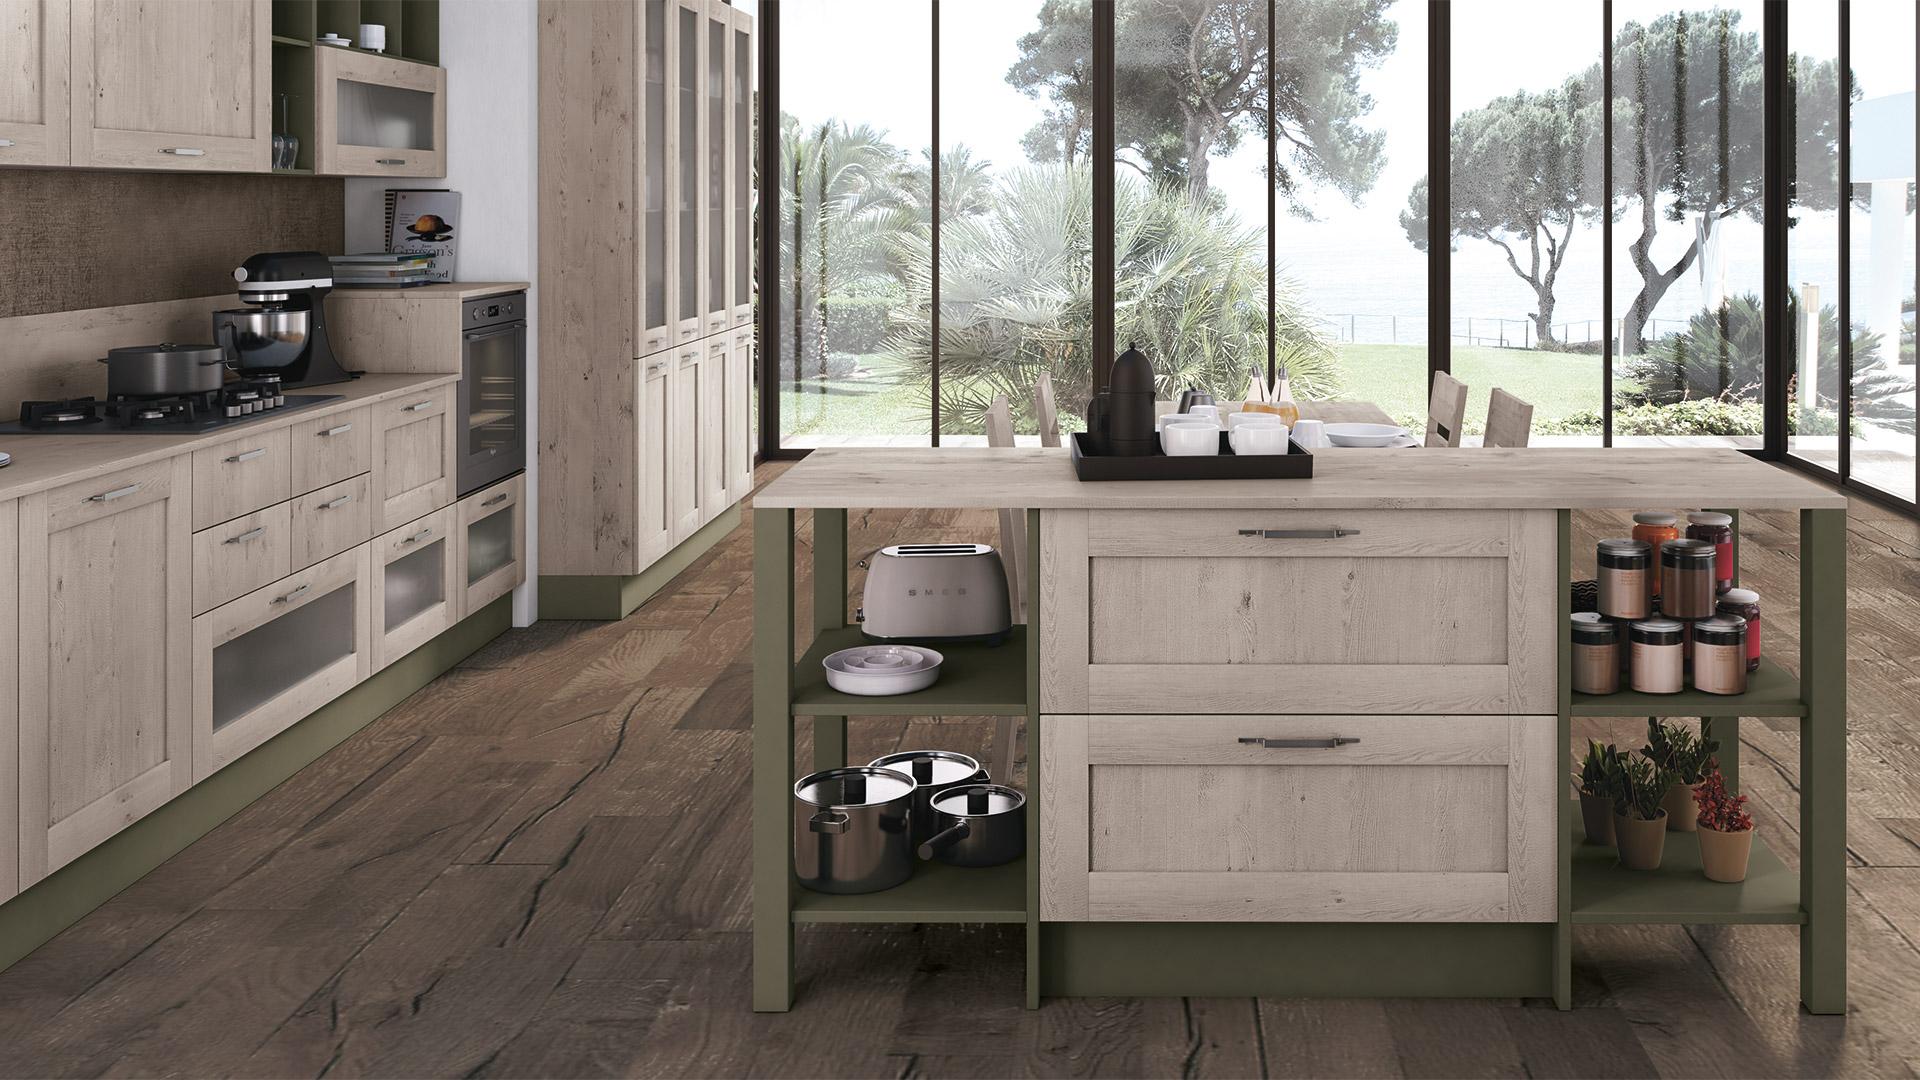 2594_kyra-telaio-cucina-ambientata-17